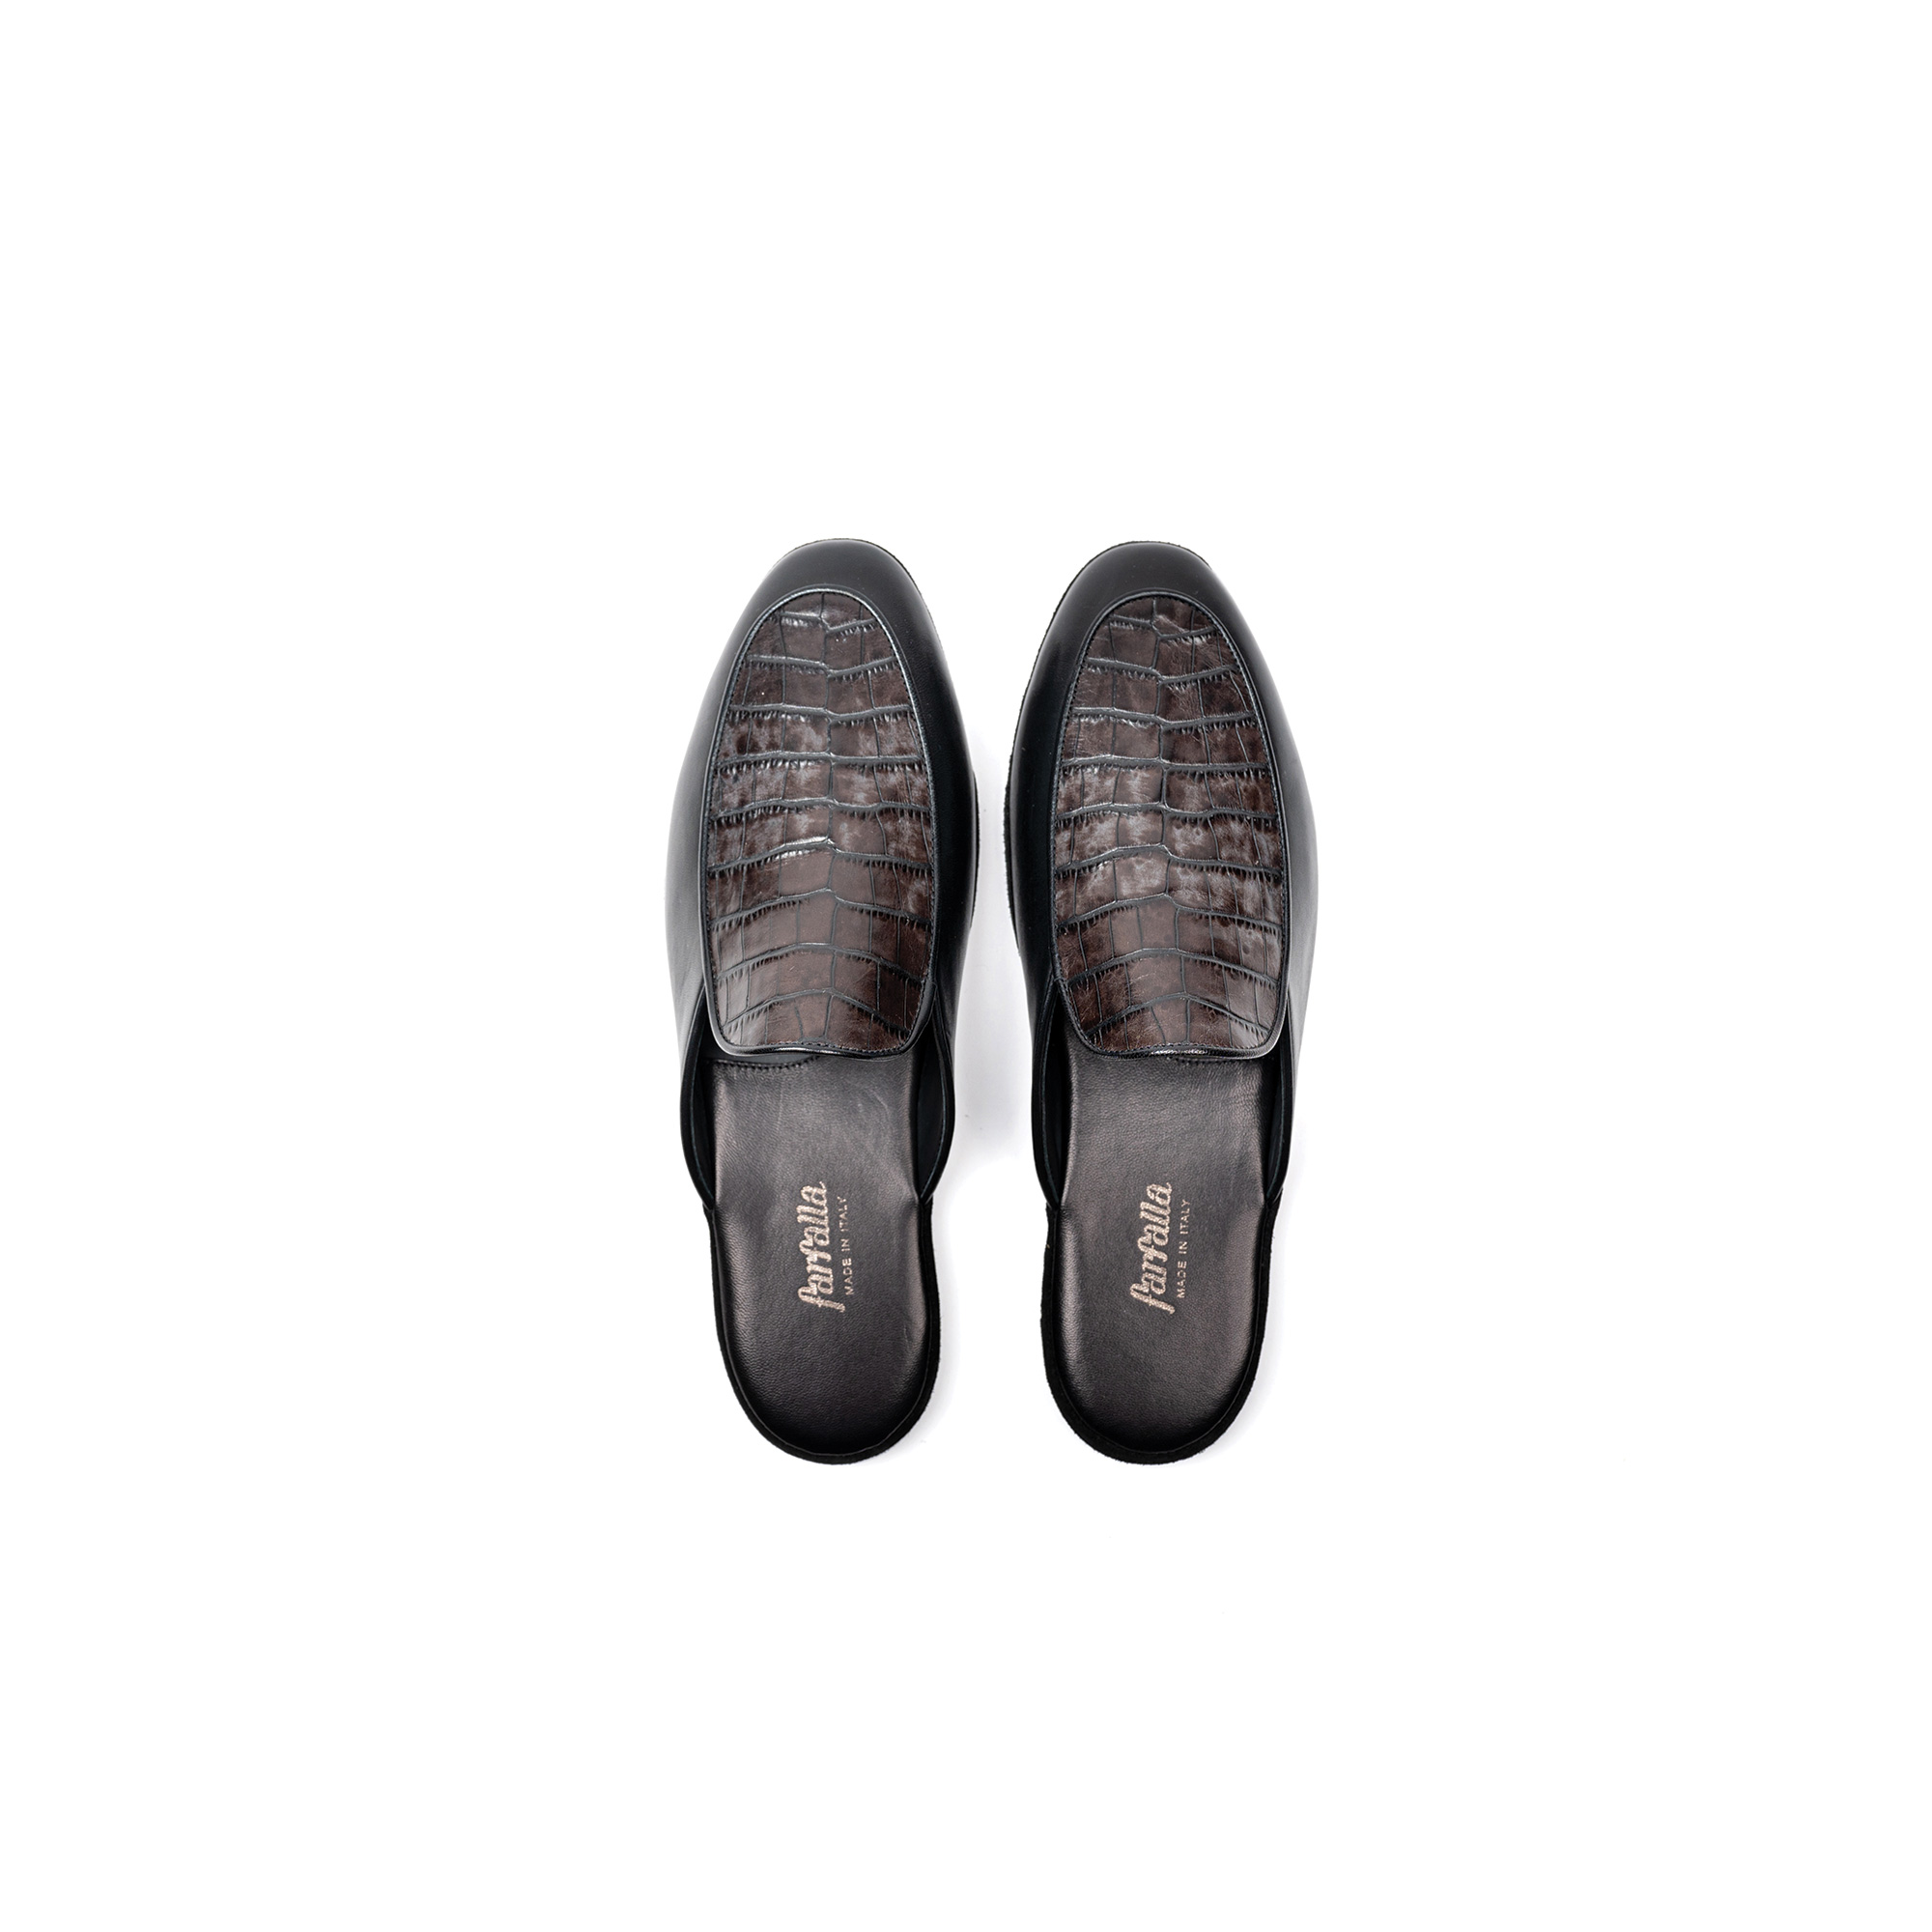 Indoor luxury slipper in black napa leather - Farfalla italian slippers